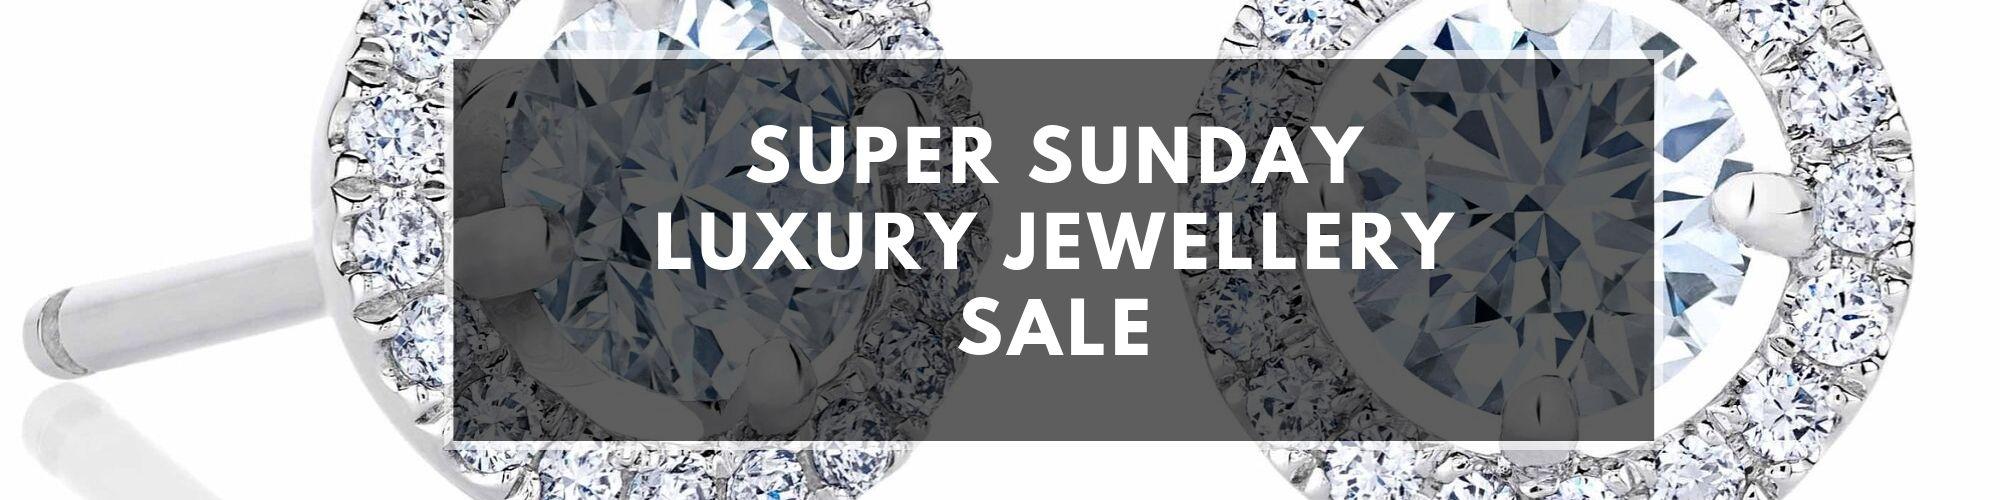 Our Regular Sunday Luxury Jewellery Sale!!